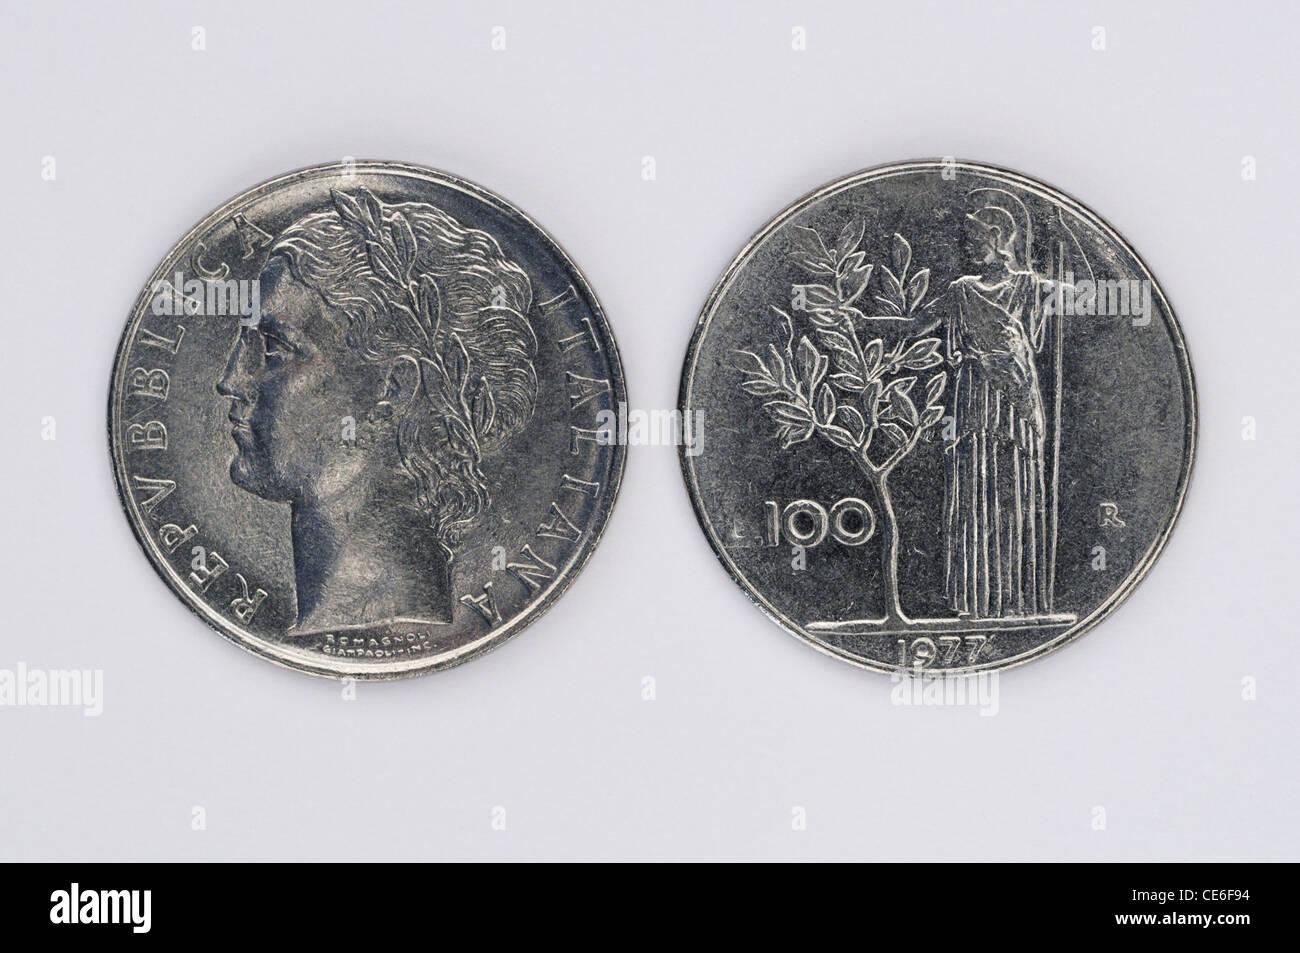 Italienische 100 Lire Münzen Stockfoto Bild 43169648 Alamy